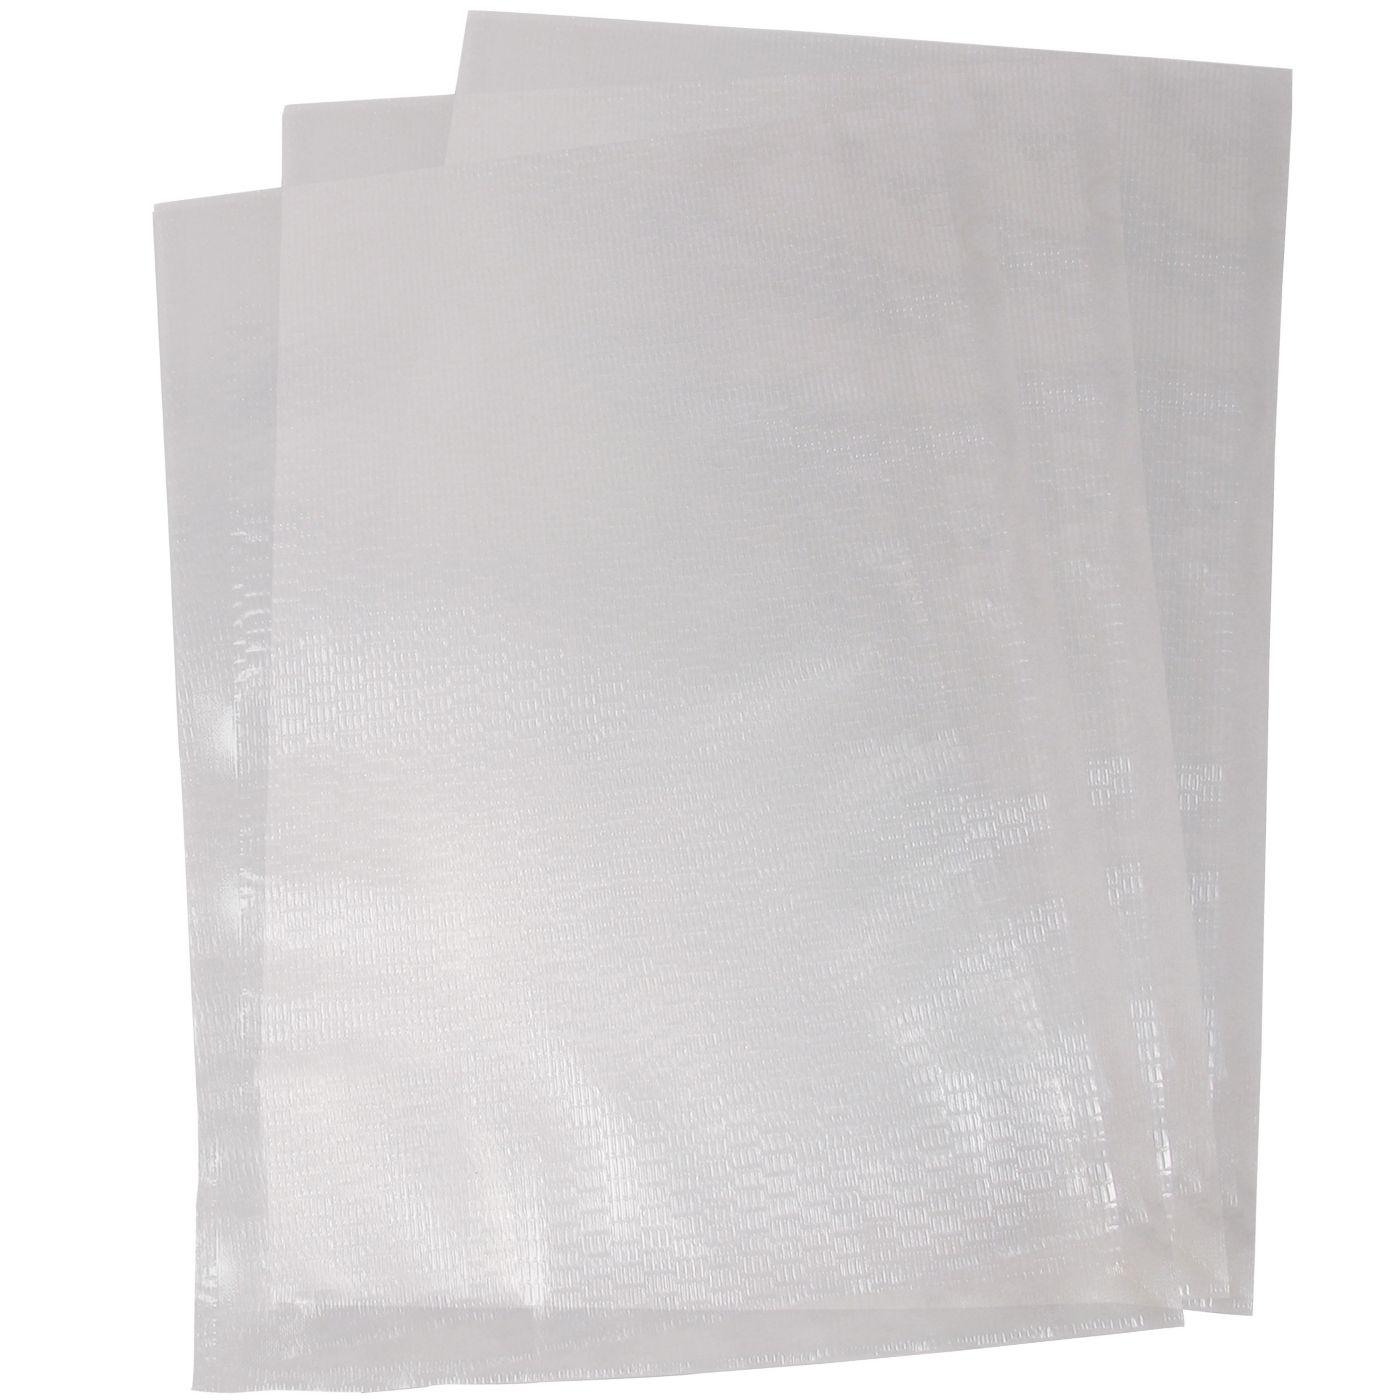 "Weston 11"" x 16"" (Gallon) Commercial Grade Vacuum Sealer Bags (100 ct.)"